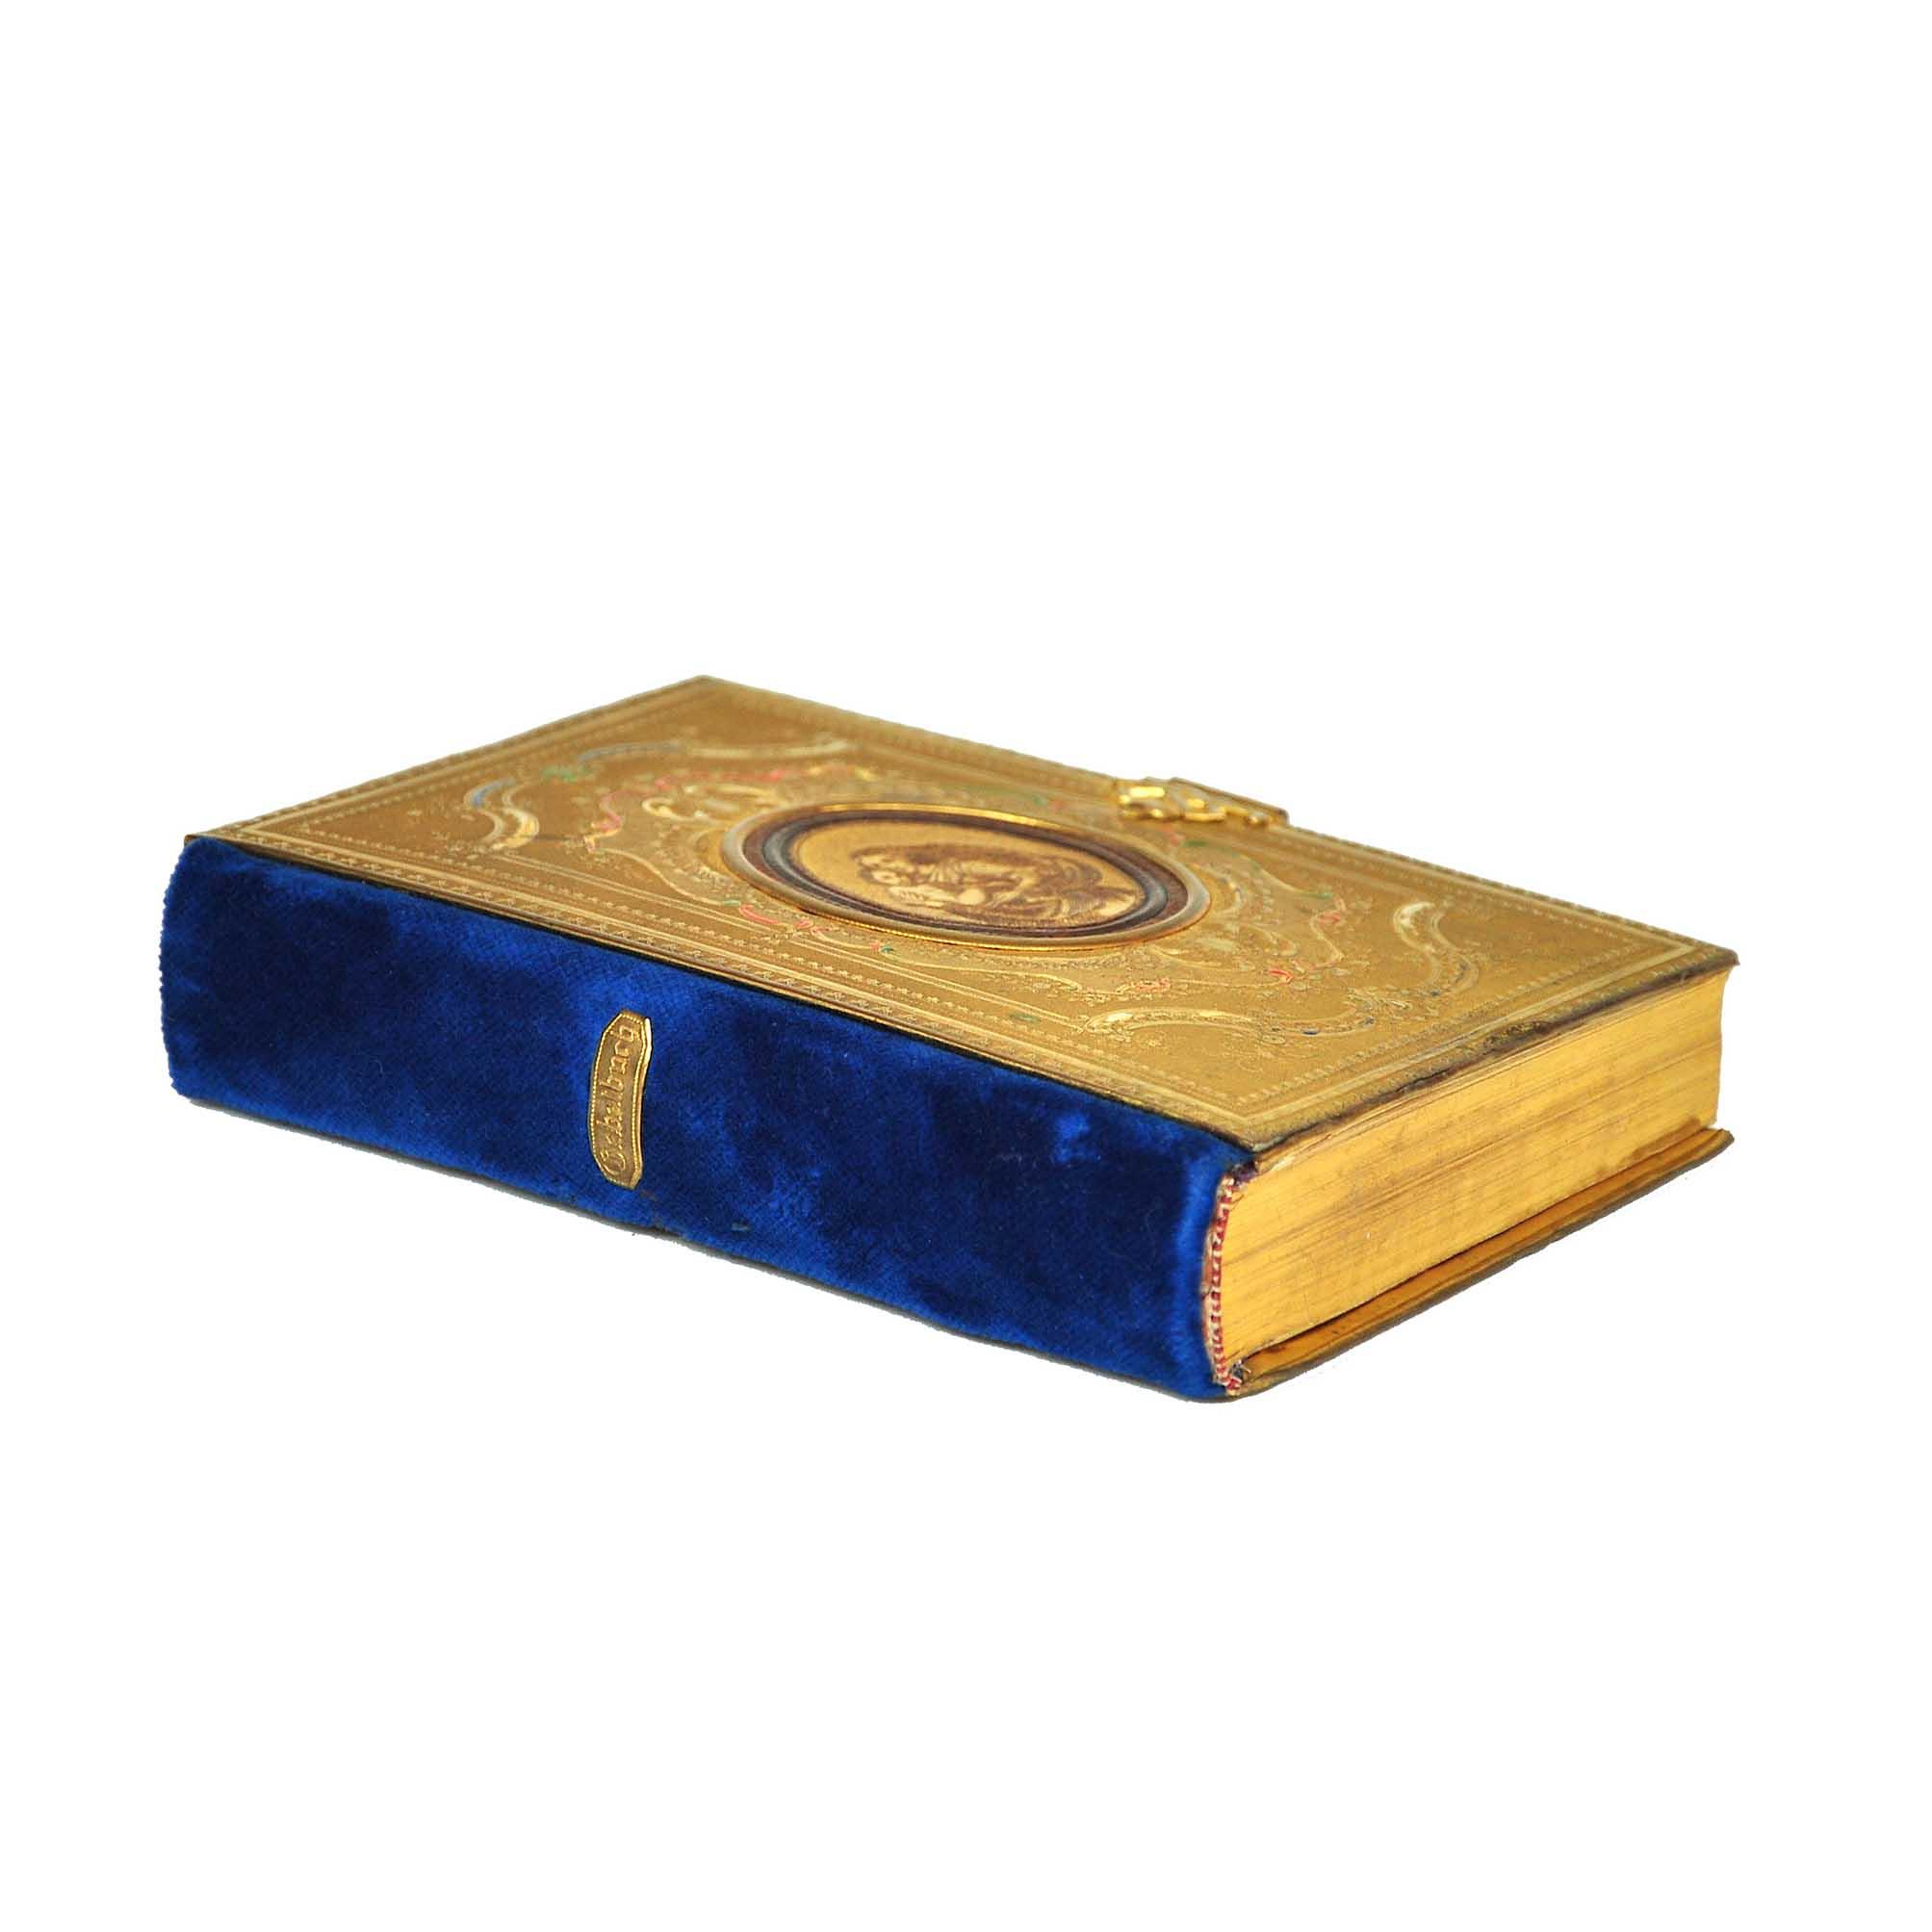 5894 Binding Eckhartshausen Gebetsbuch Ruecken Schnitt frei N